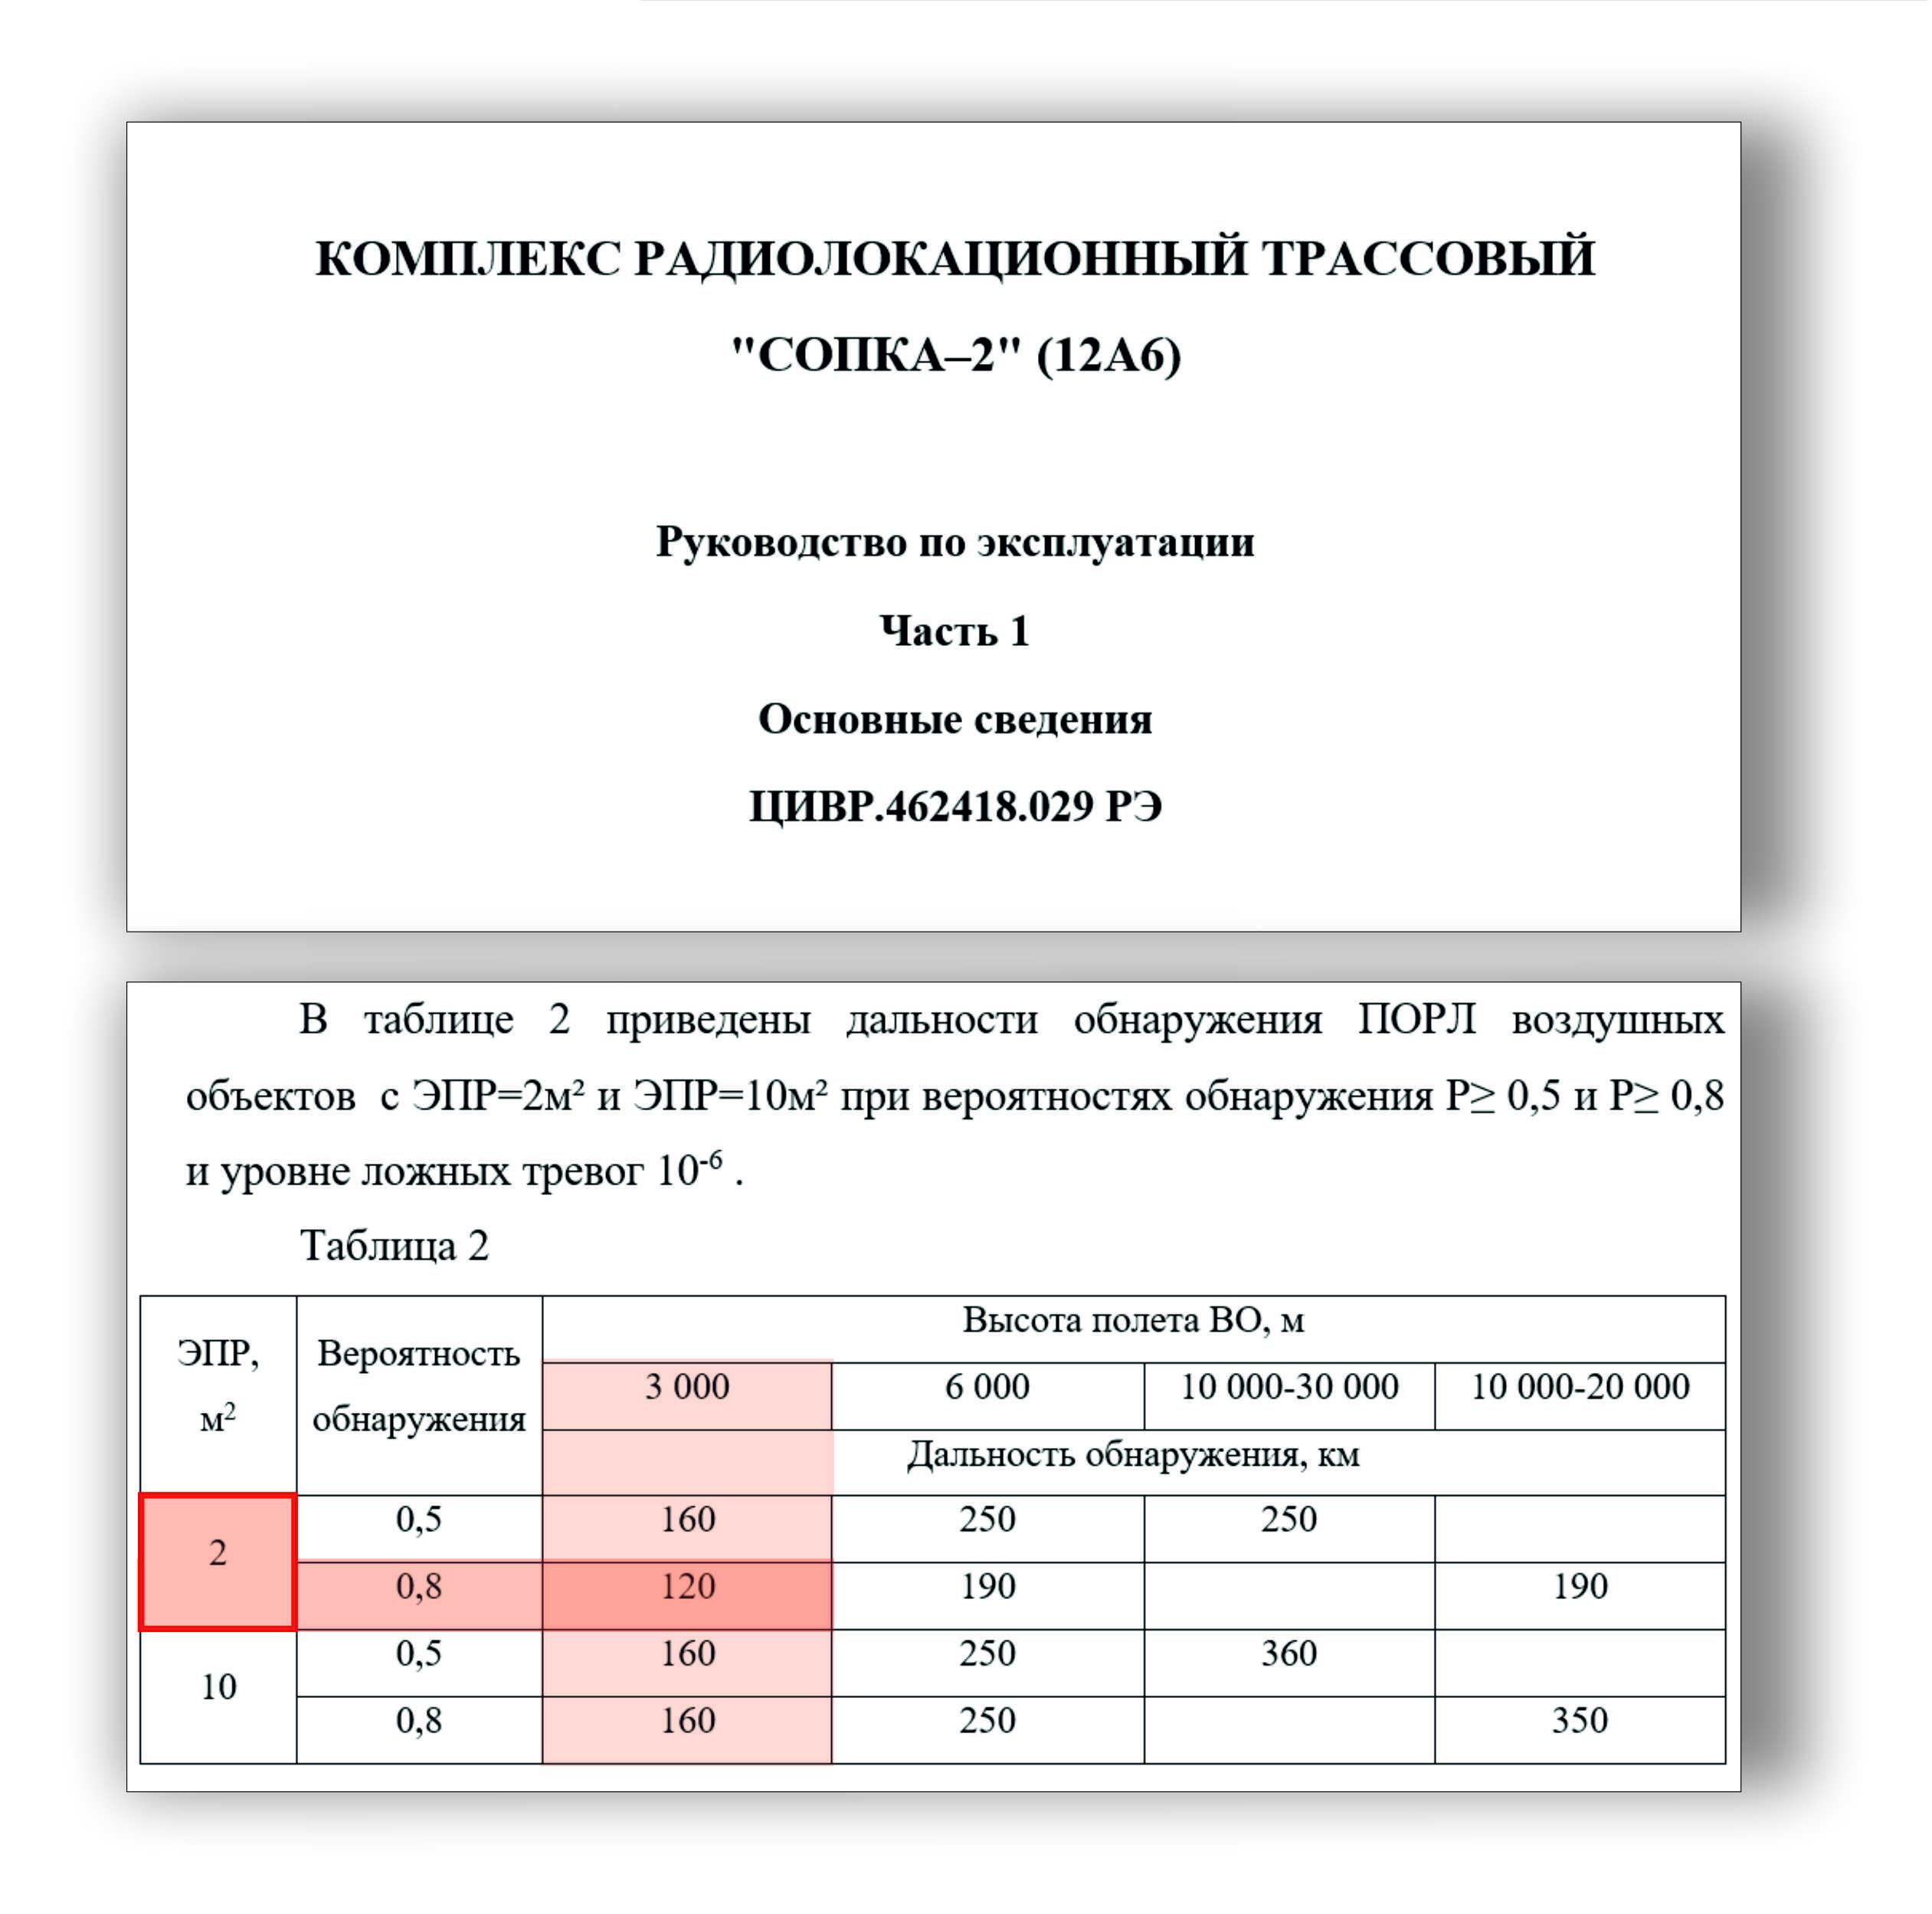 http://images.vfl.ru/ii/1622518034/48aec33e/34661418.jpg